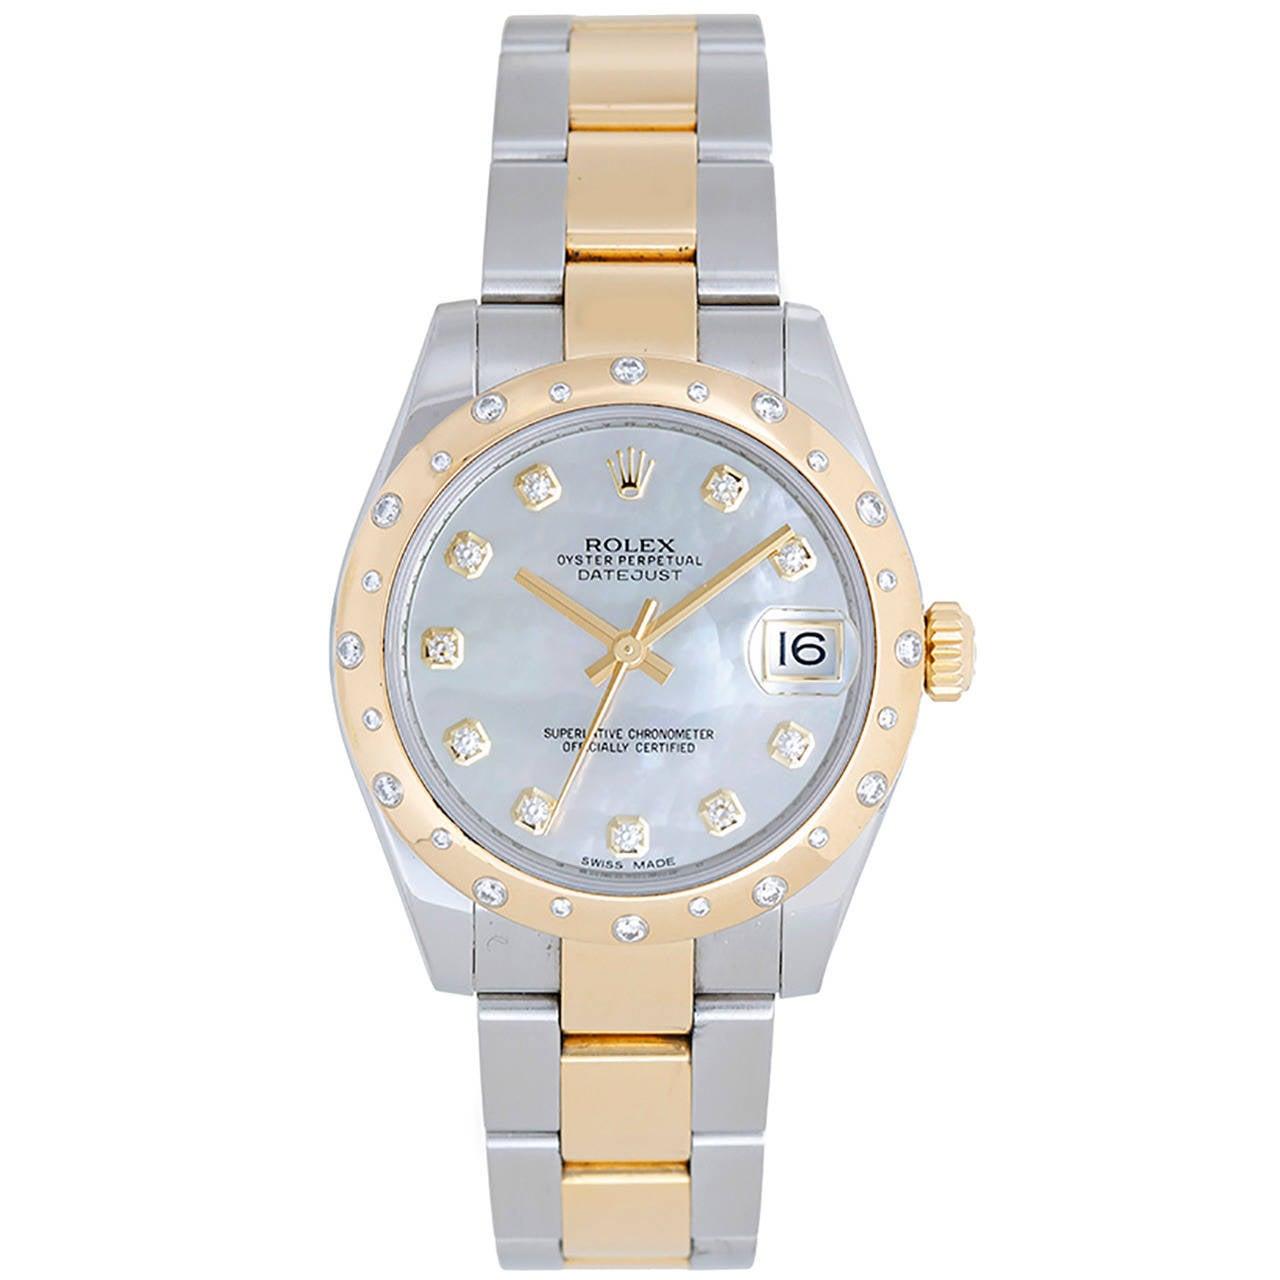 Rolex Yellow Gold Stainless Steel Datejust Diamond Dome Bezel Wristwatch